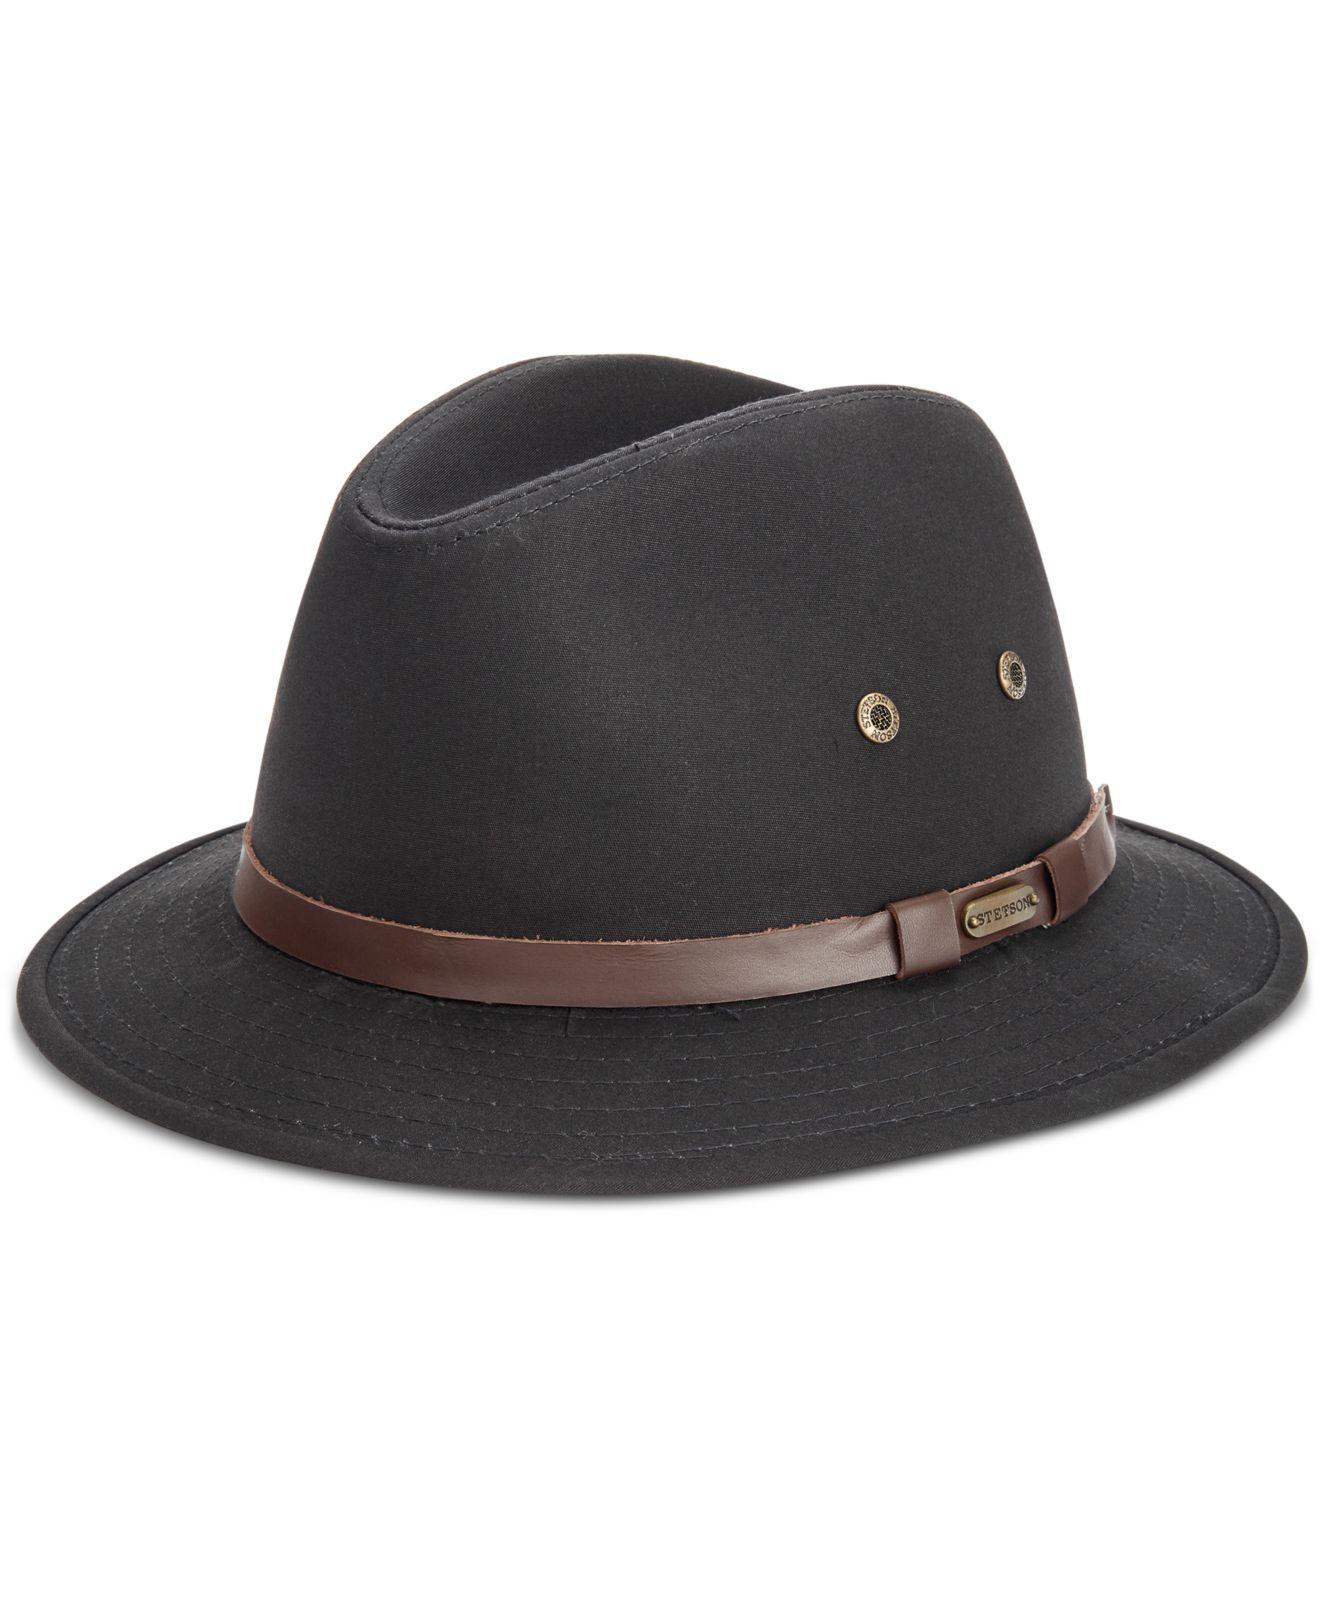 025a0164 Lyst - Dorfman Pacific Gable Rain Safari Hat in Black for Men